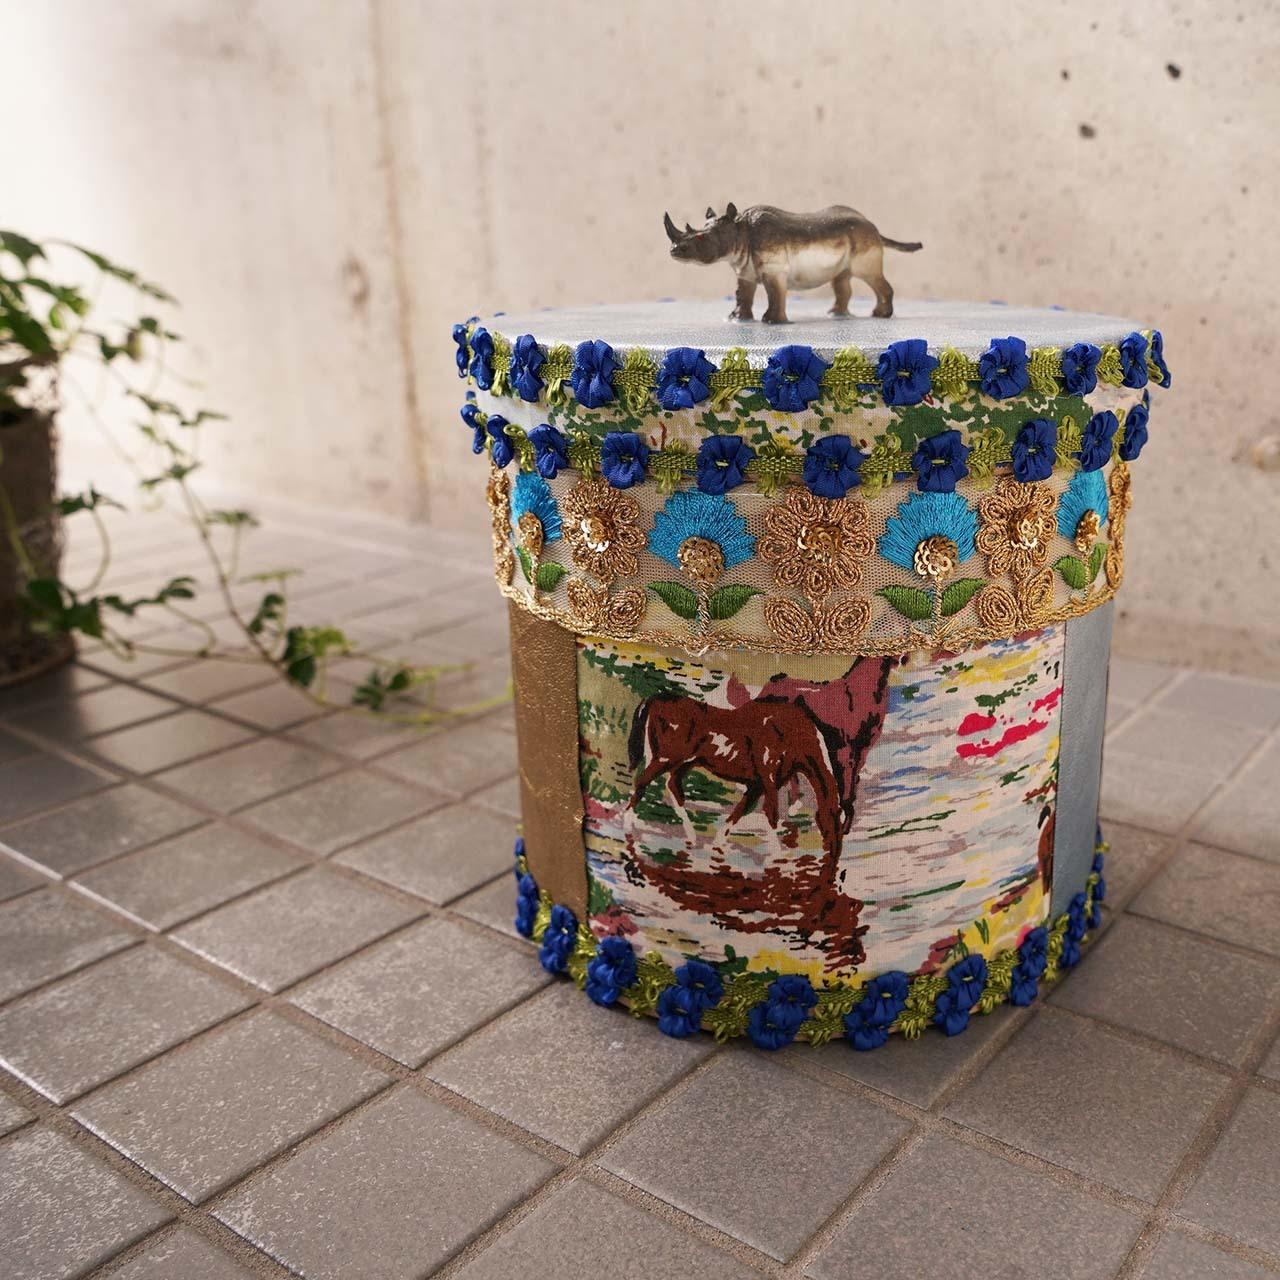 hug2フードボックスfood box(rhinoceros)